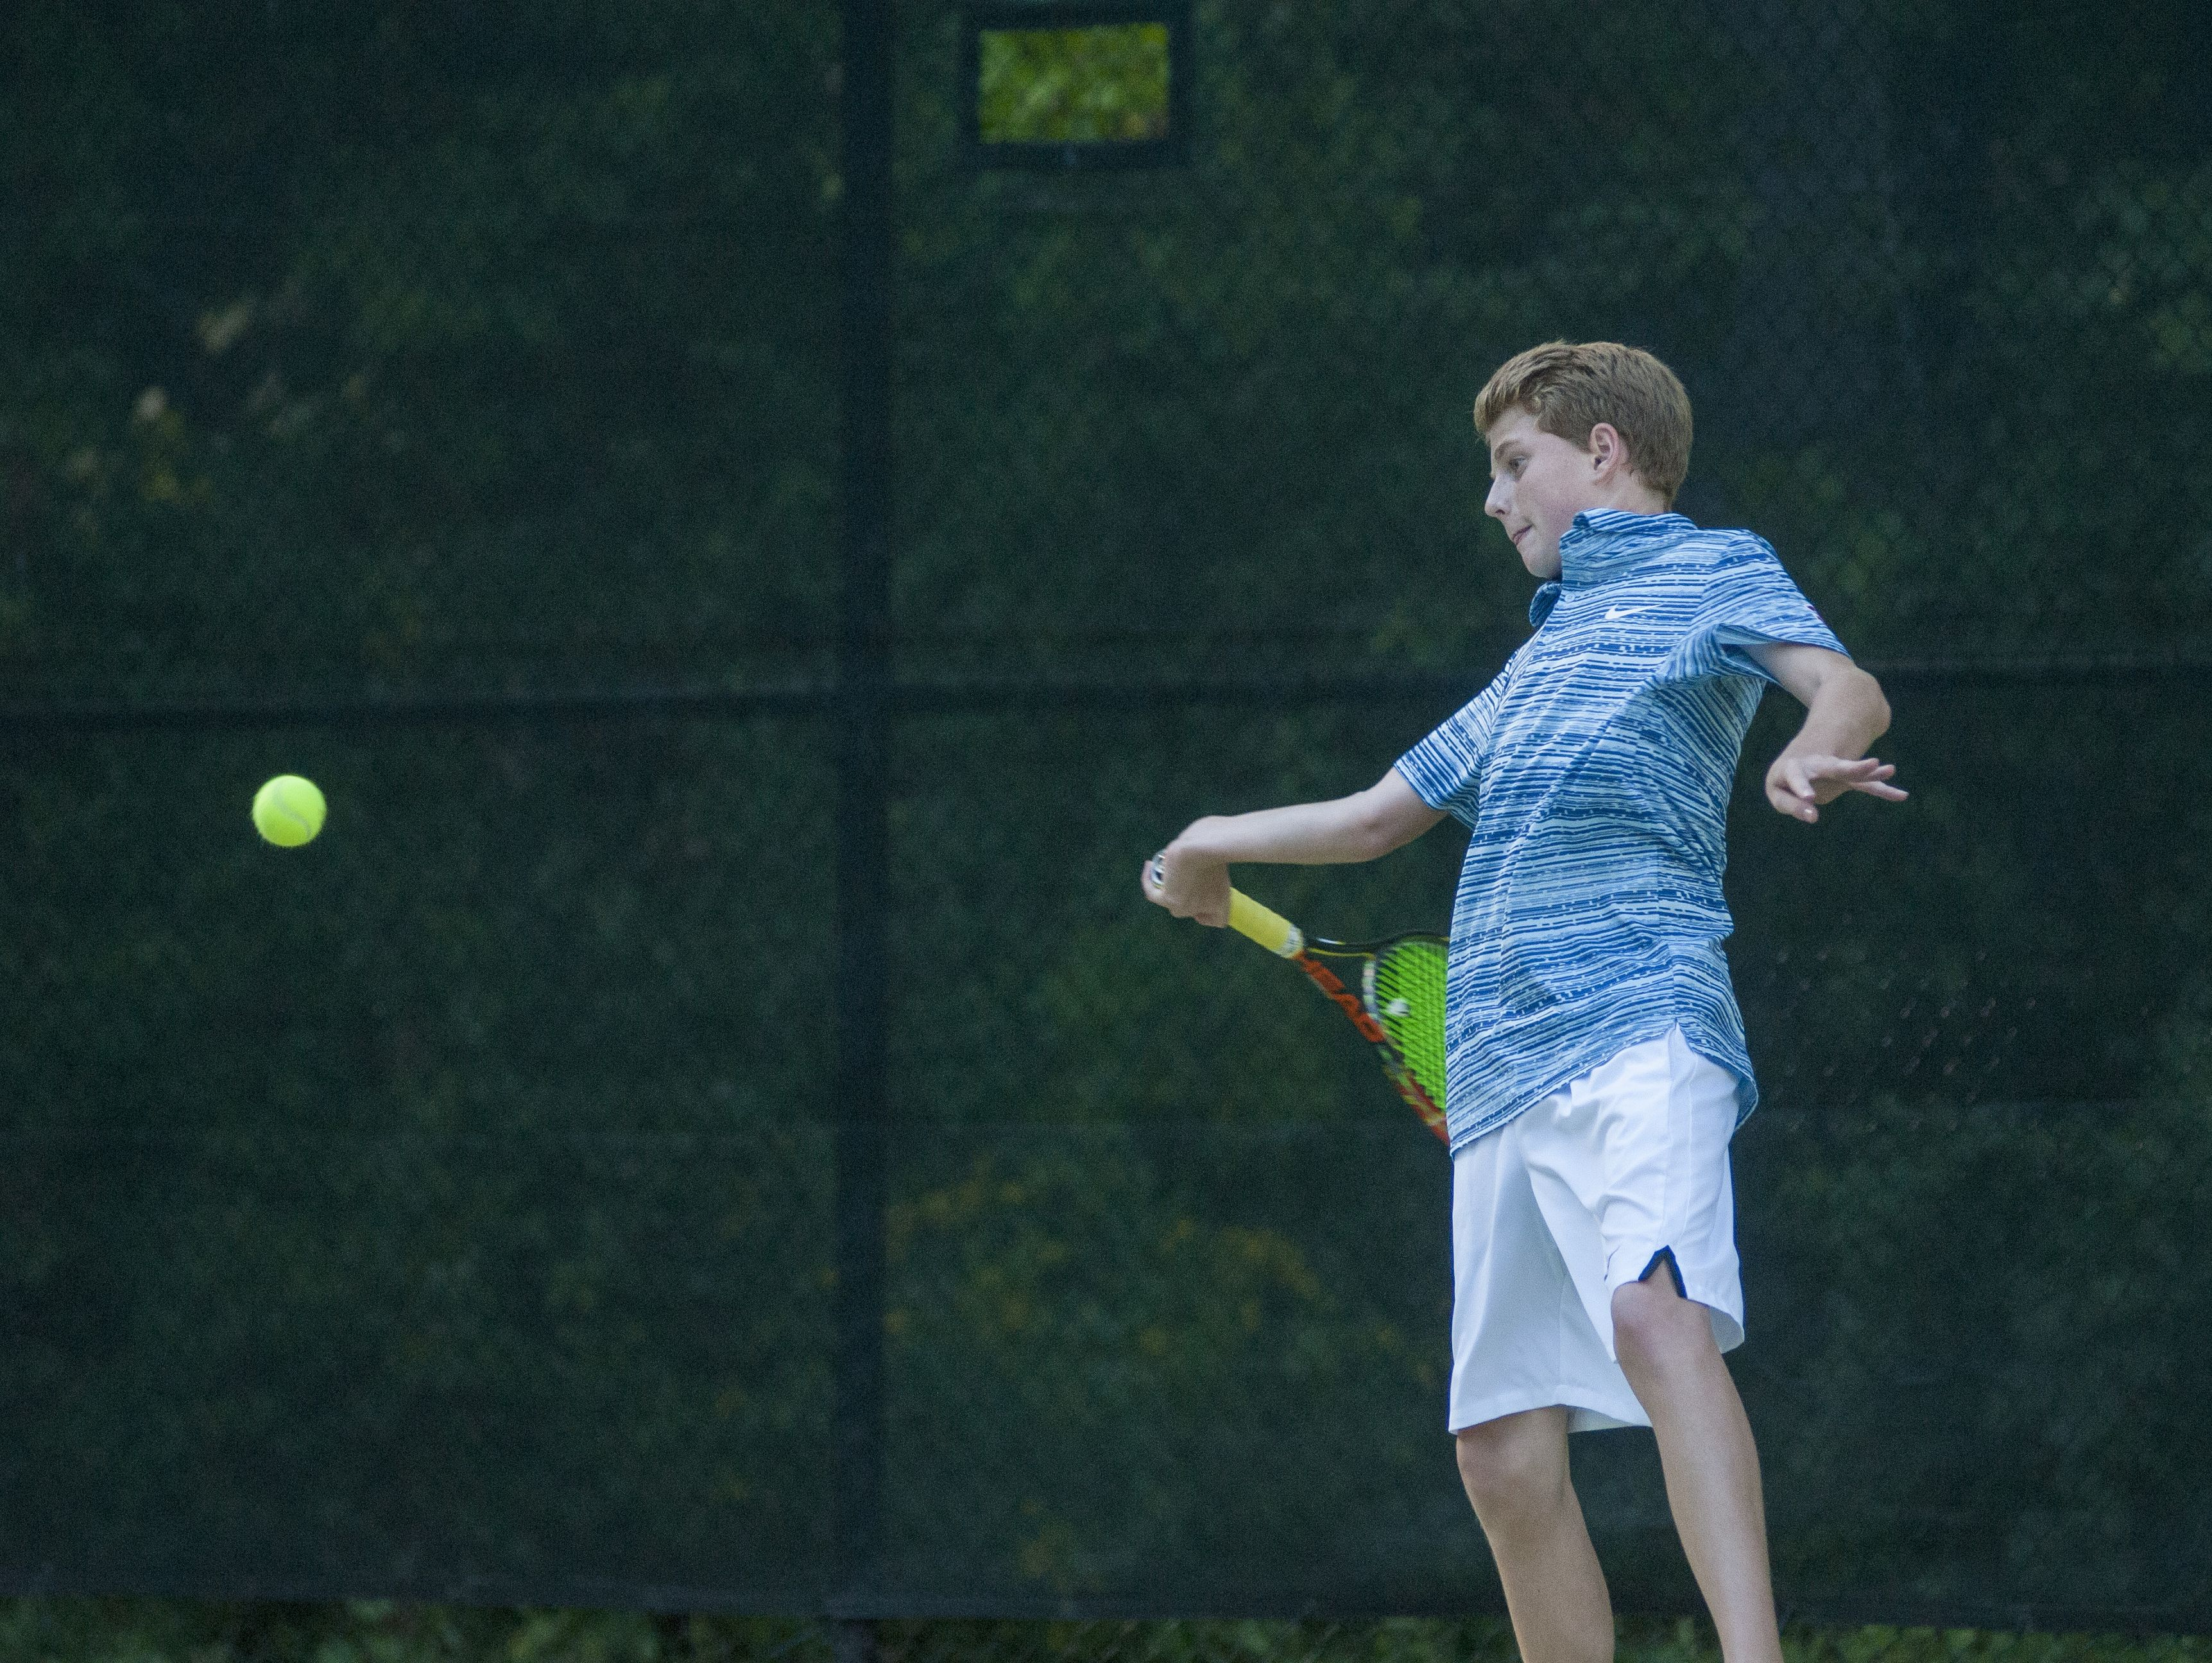 Saints' Eli Pinnoo readues a forehand return Monday, Sept. 12, during boys tennis action at Sanborn Park tennis courts.